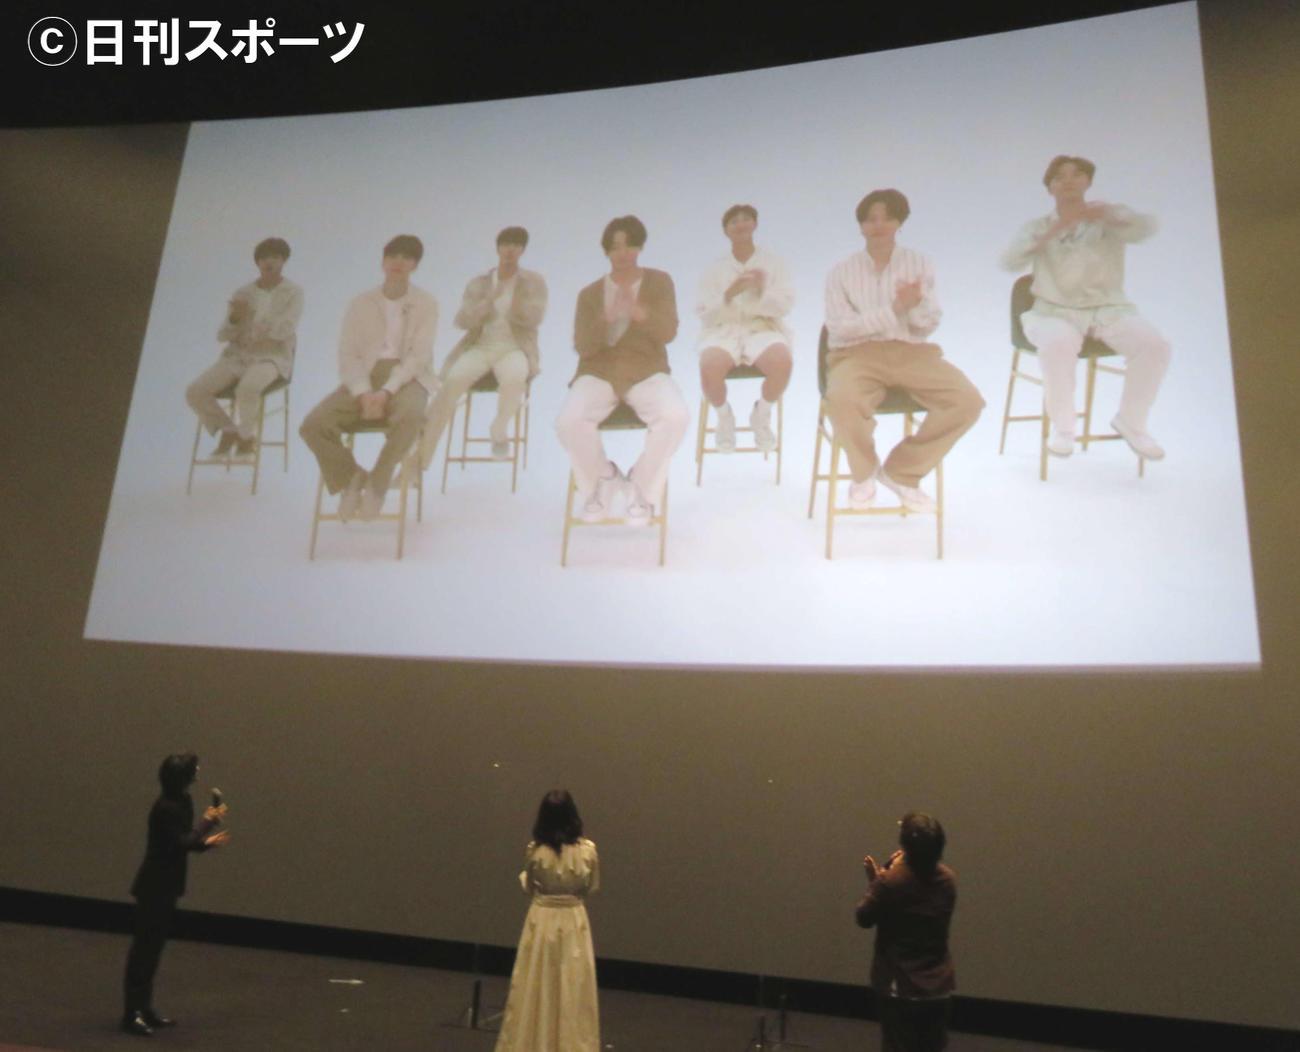 BTSのビデオメッセージを見る、左から横浜流星、吉高由里子、三木孝浩監督(撮影・村上幸将)